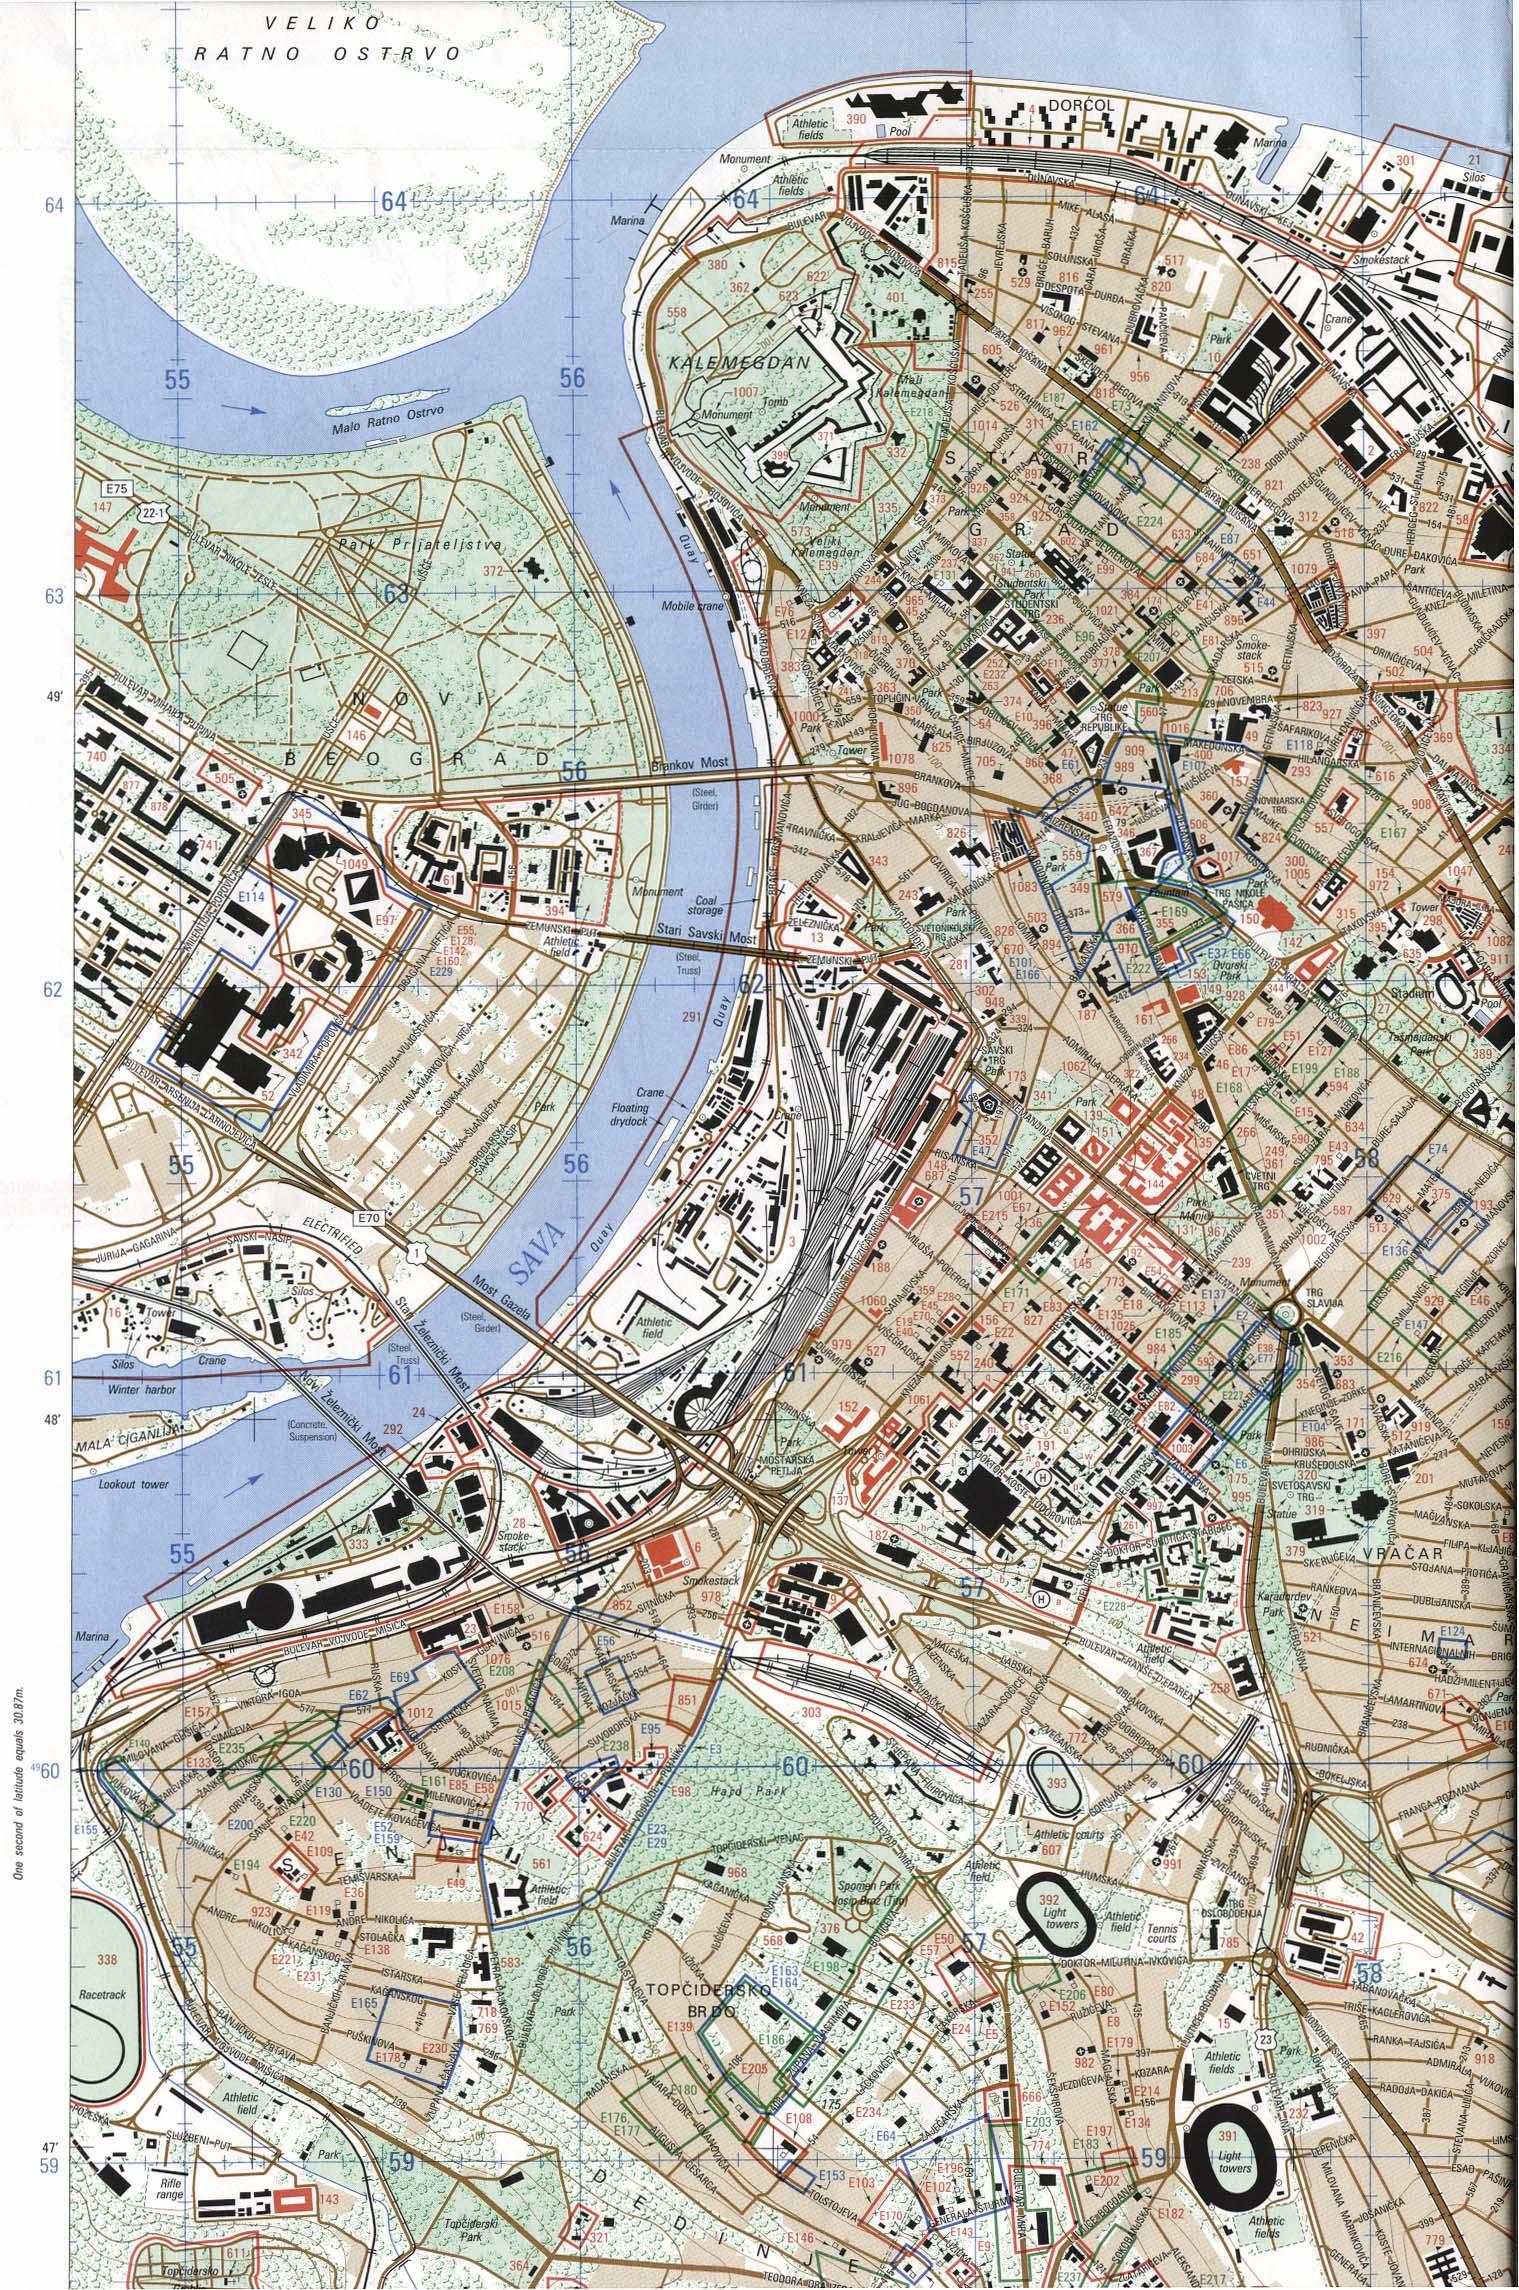 Belgrade (Beograd) City Map, Serbia